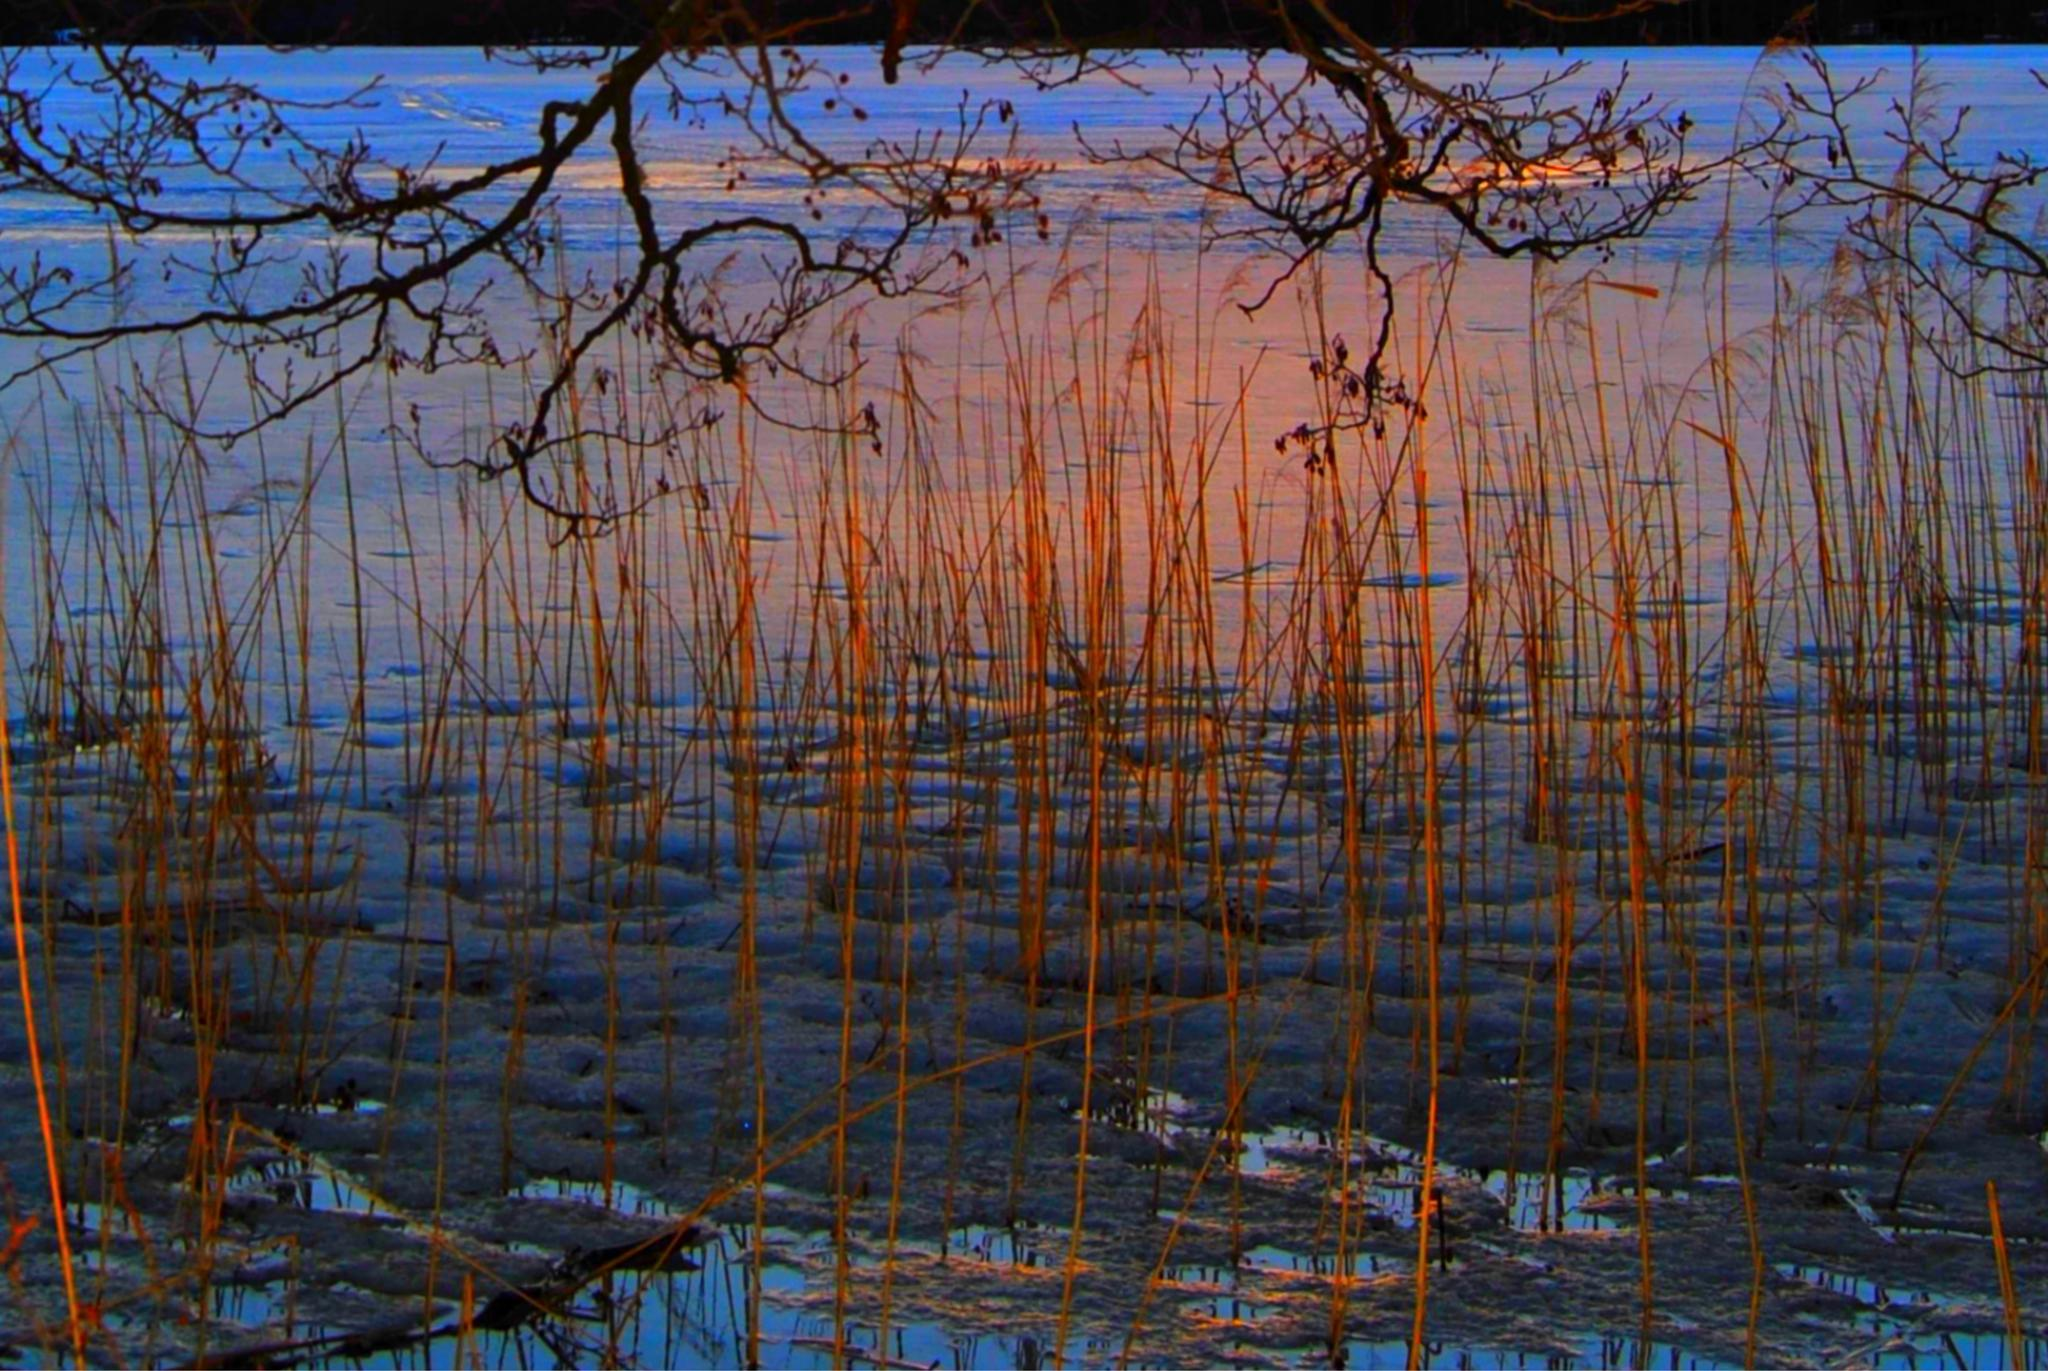 """Sunset glow"" on a frozen lake - ""Kajo"" by laura.kamil"